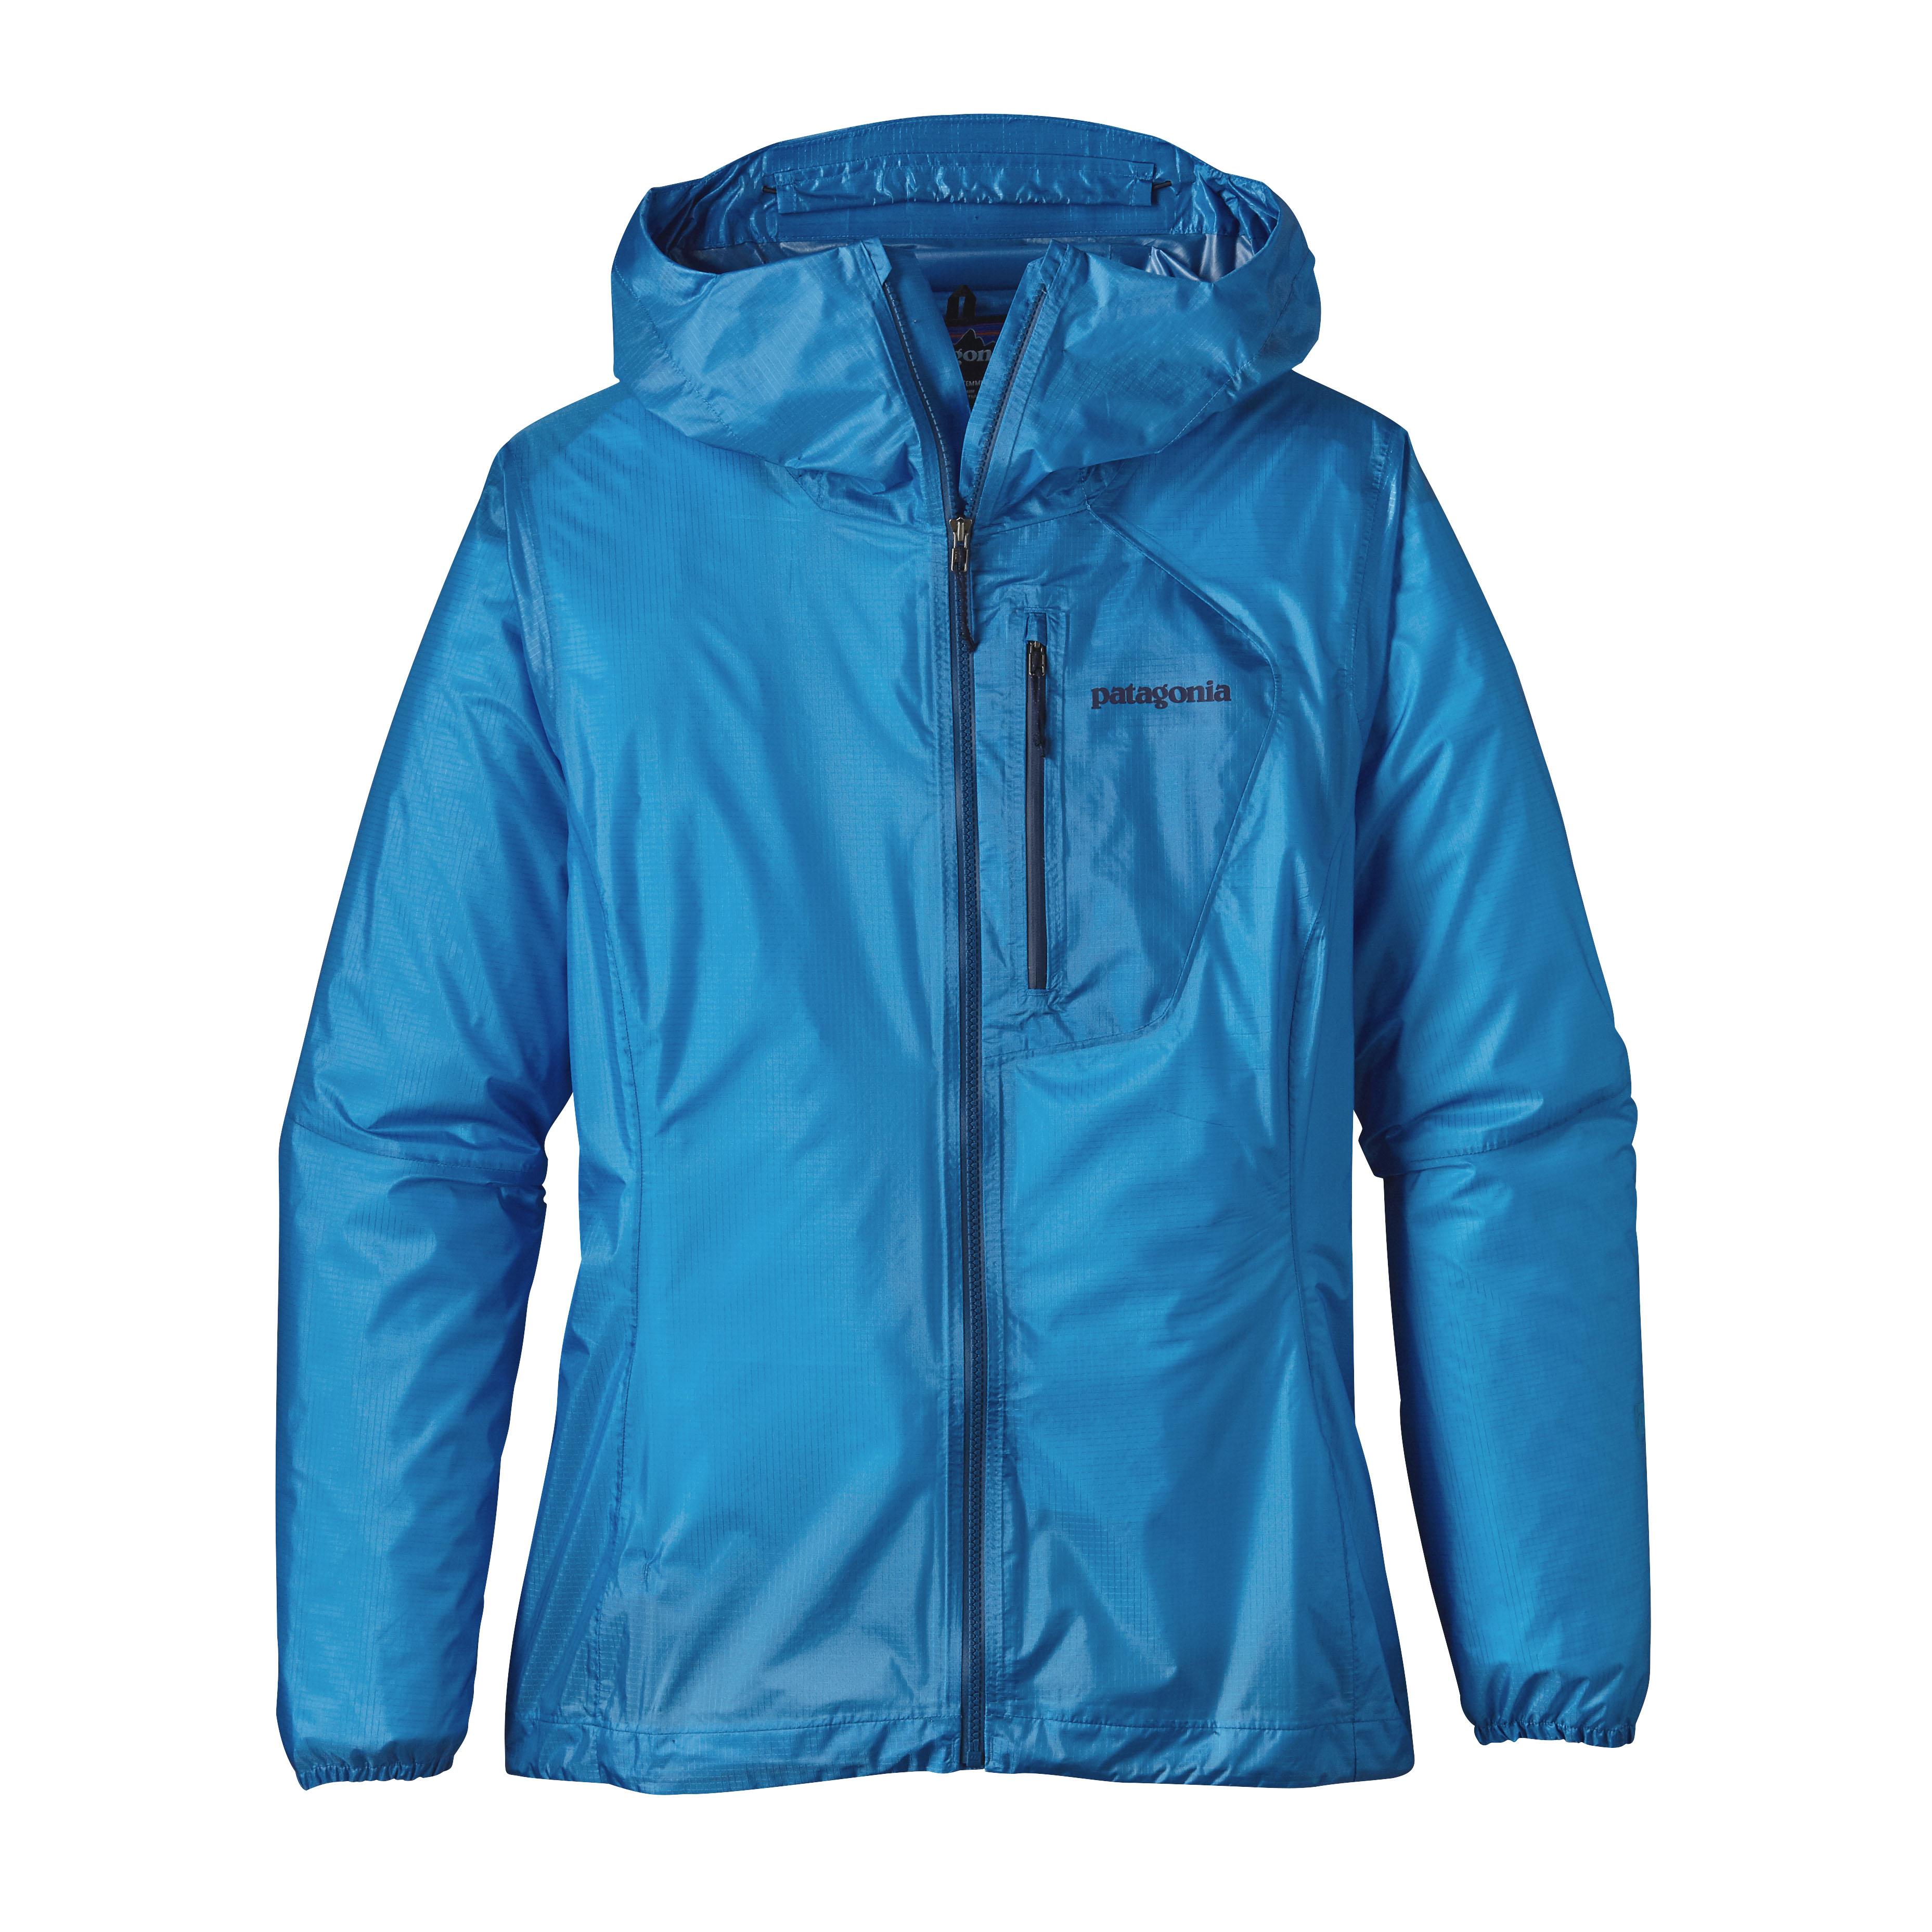 RUNULTRA_Waterproof-lightweight-jackets-review_patagonia-alpine-houdini